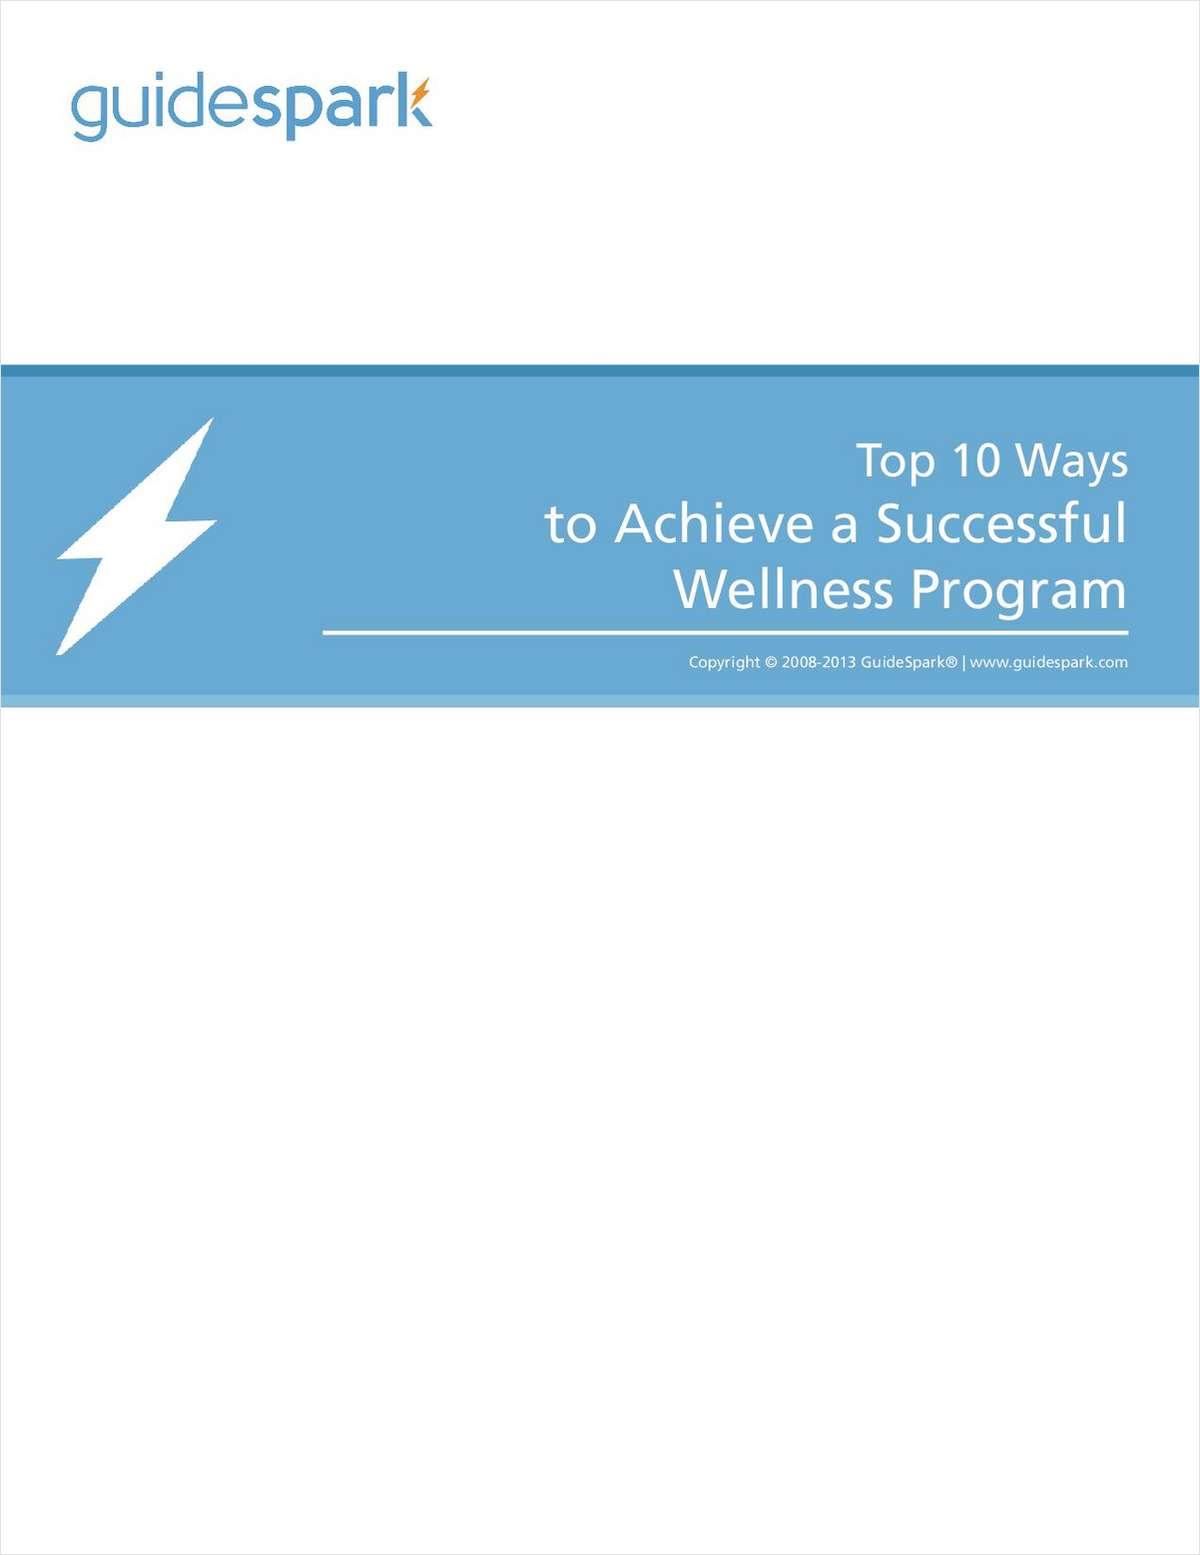 Top 10 Ways to Achieve a Successful Wellness Program